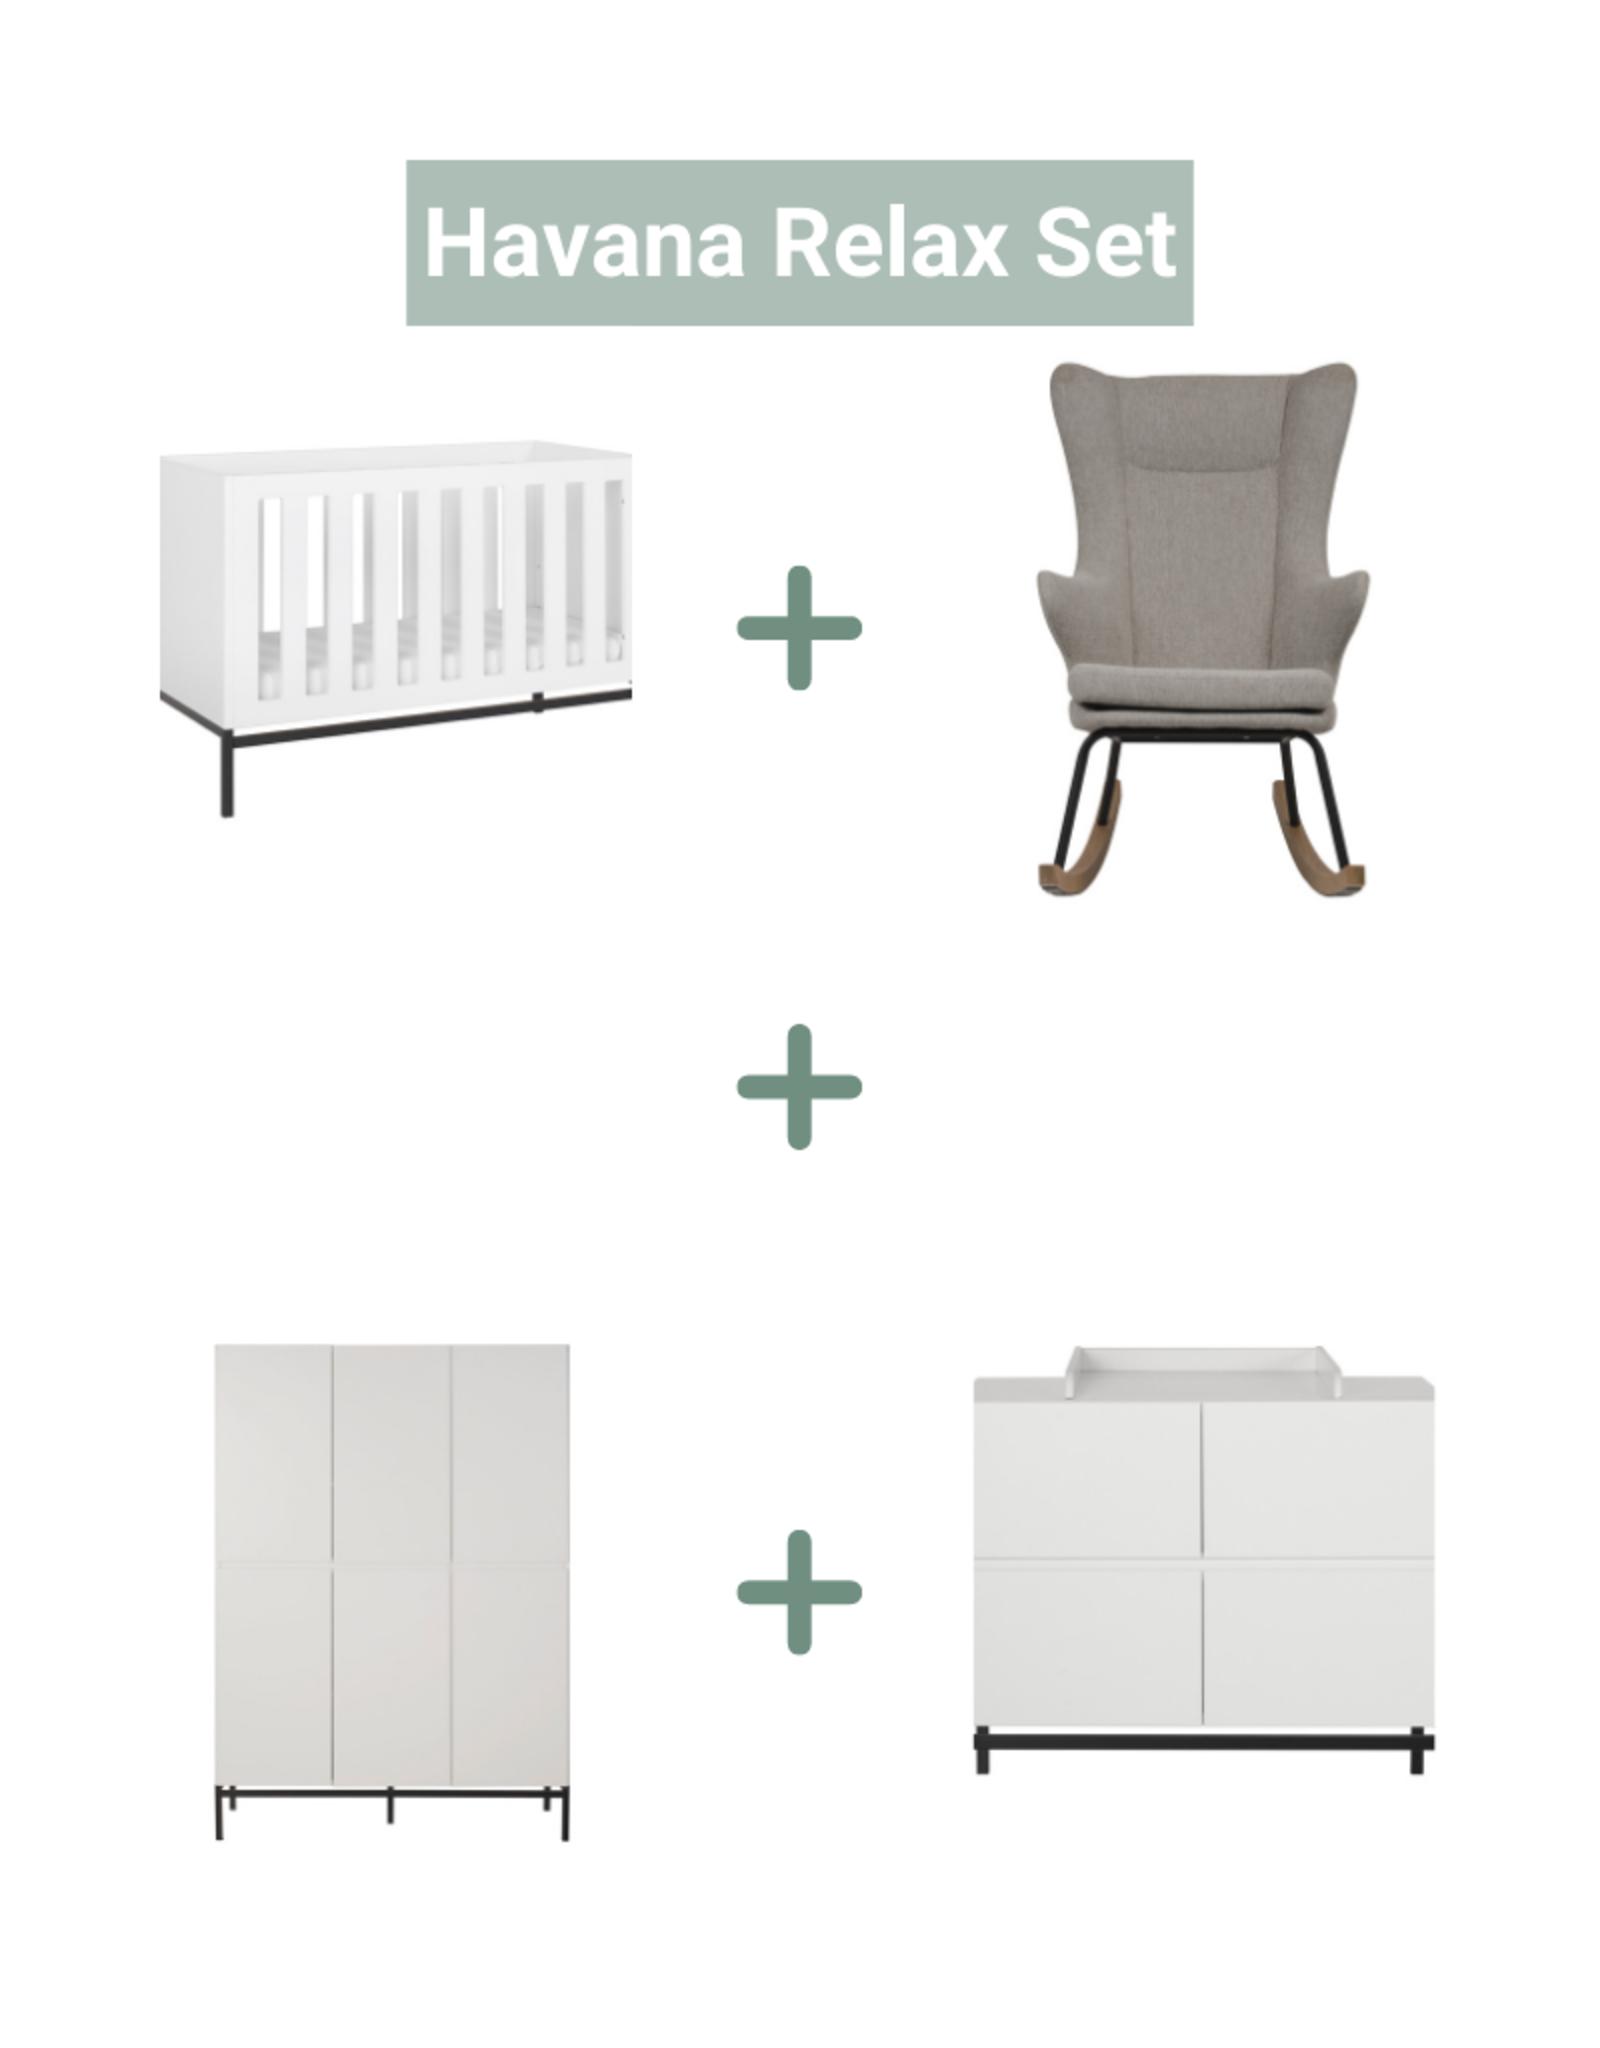 Quax Havana Relax Set